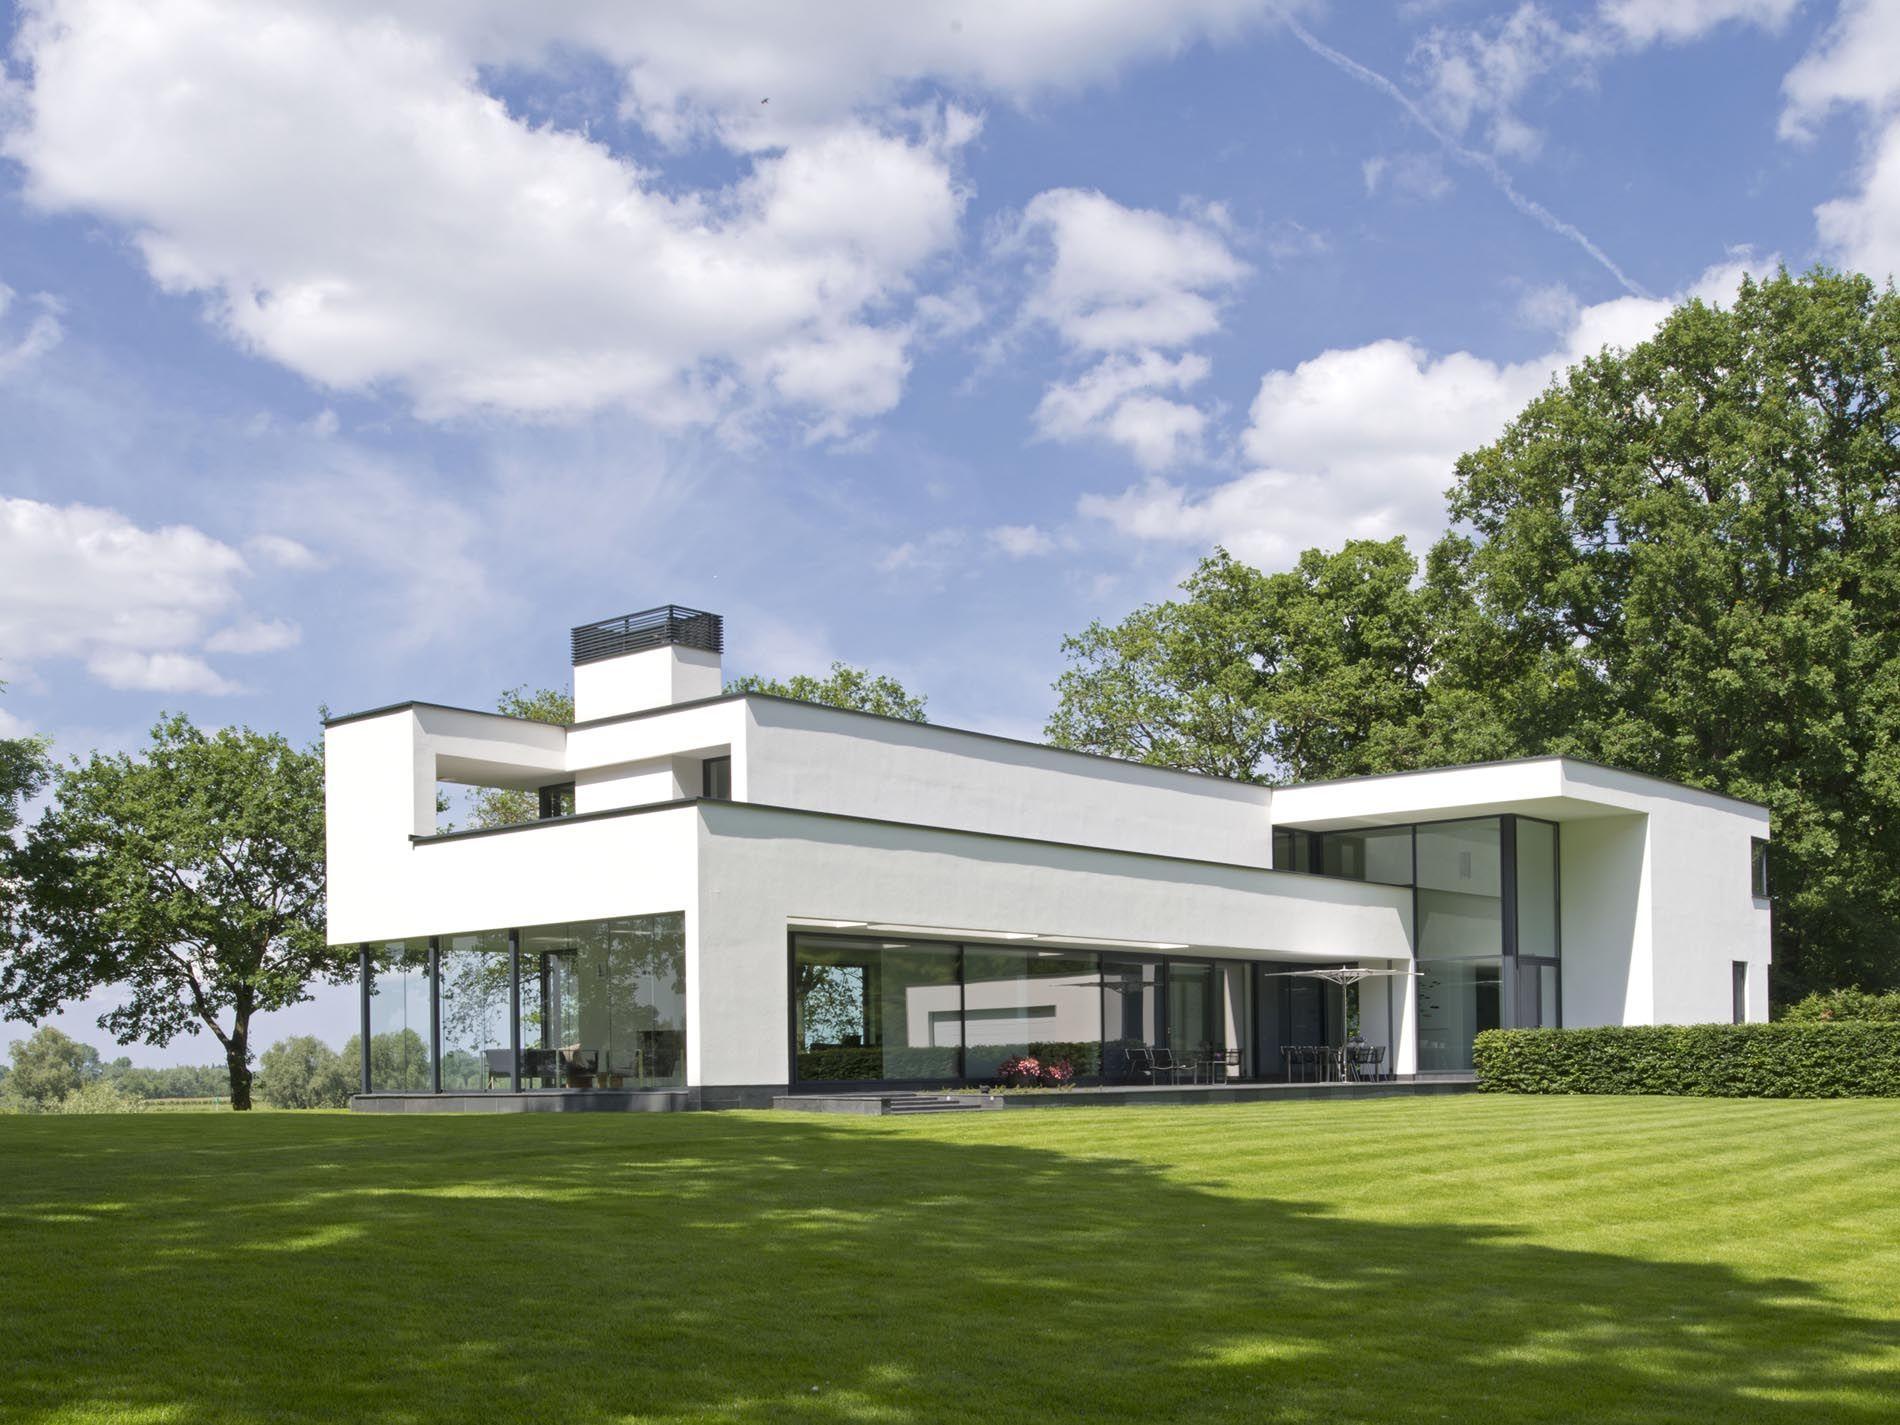 Maas architecten woonhuis gorssel stucwerk modern villa strak